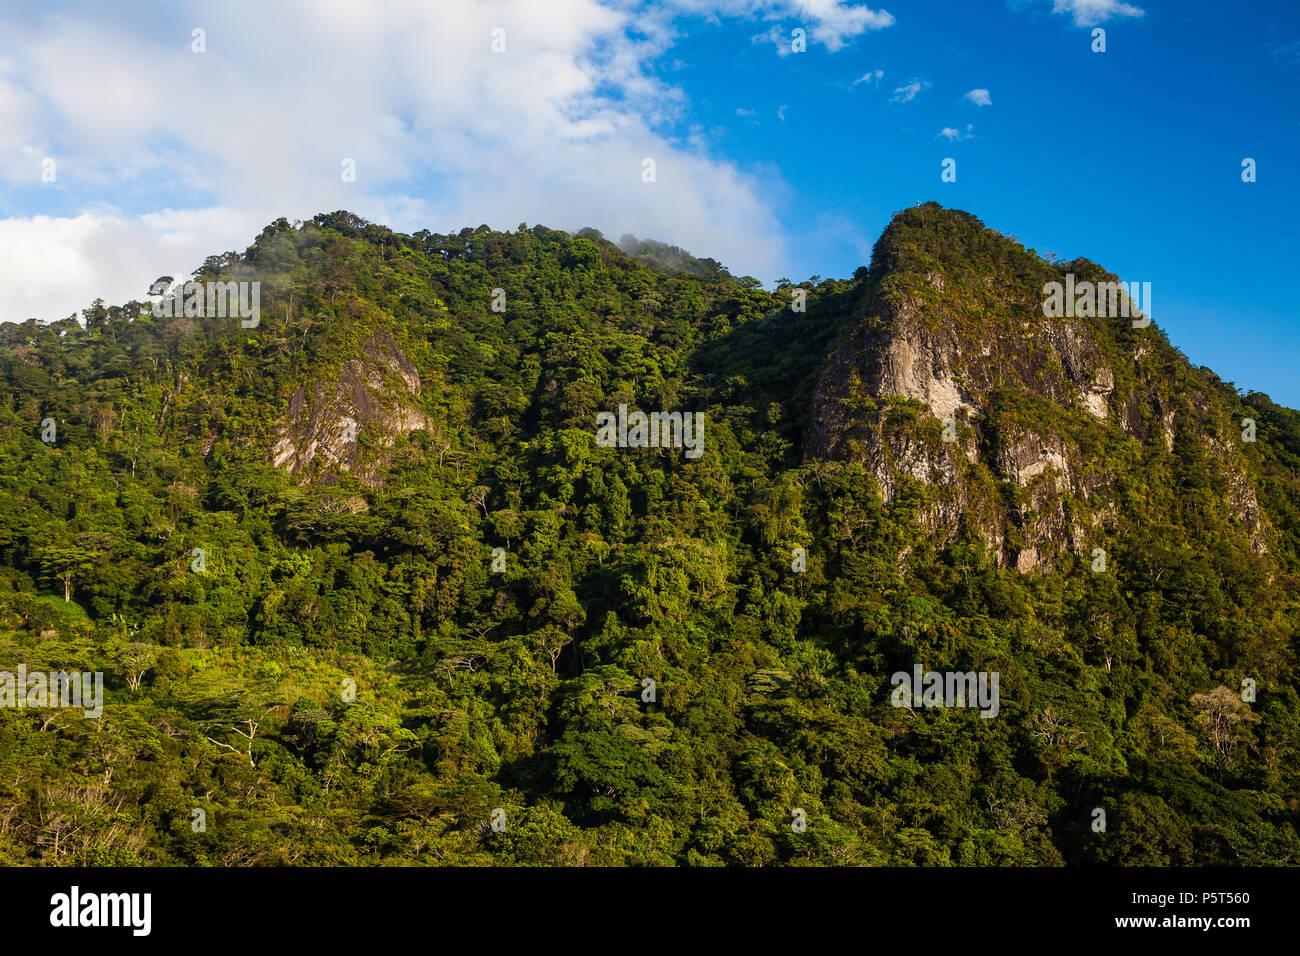 Early morning light in Altos de Campana national park, Cordillera Central, Republic of Panama. Cerro la Cruz is to the right. Stock Photo